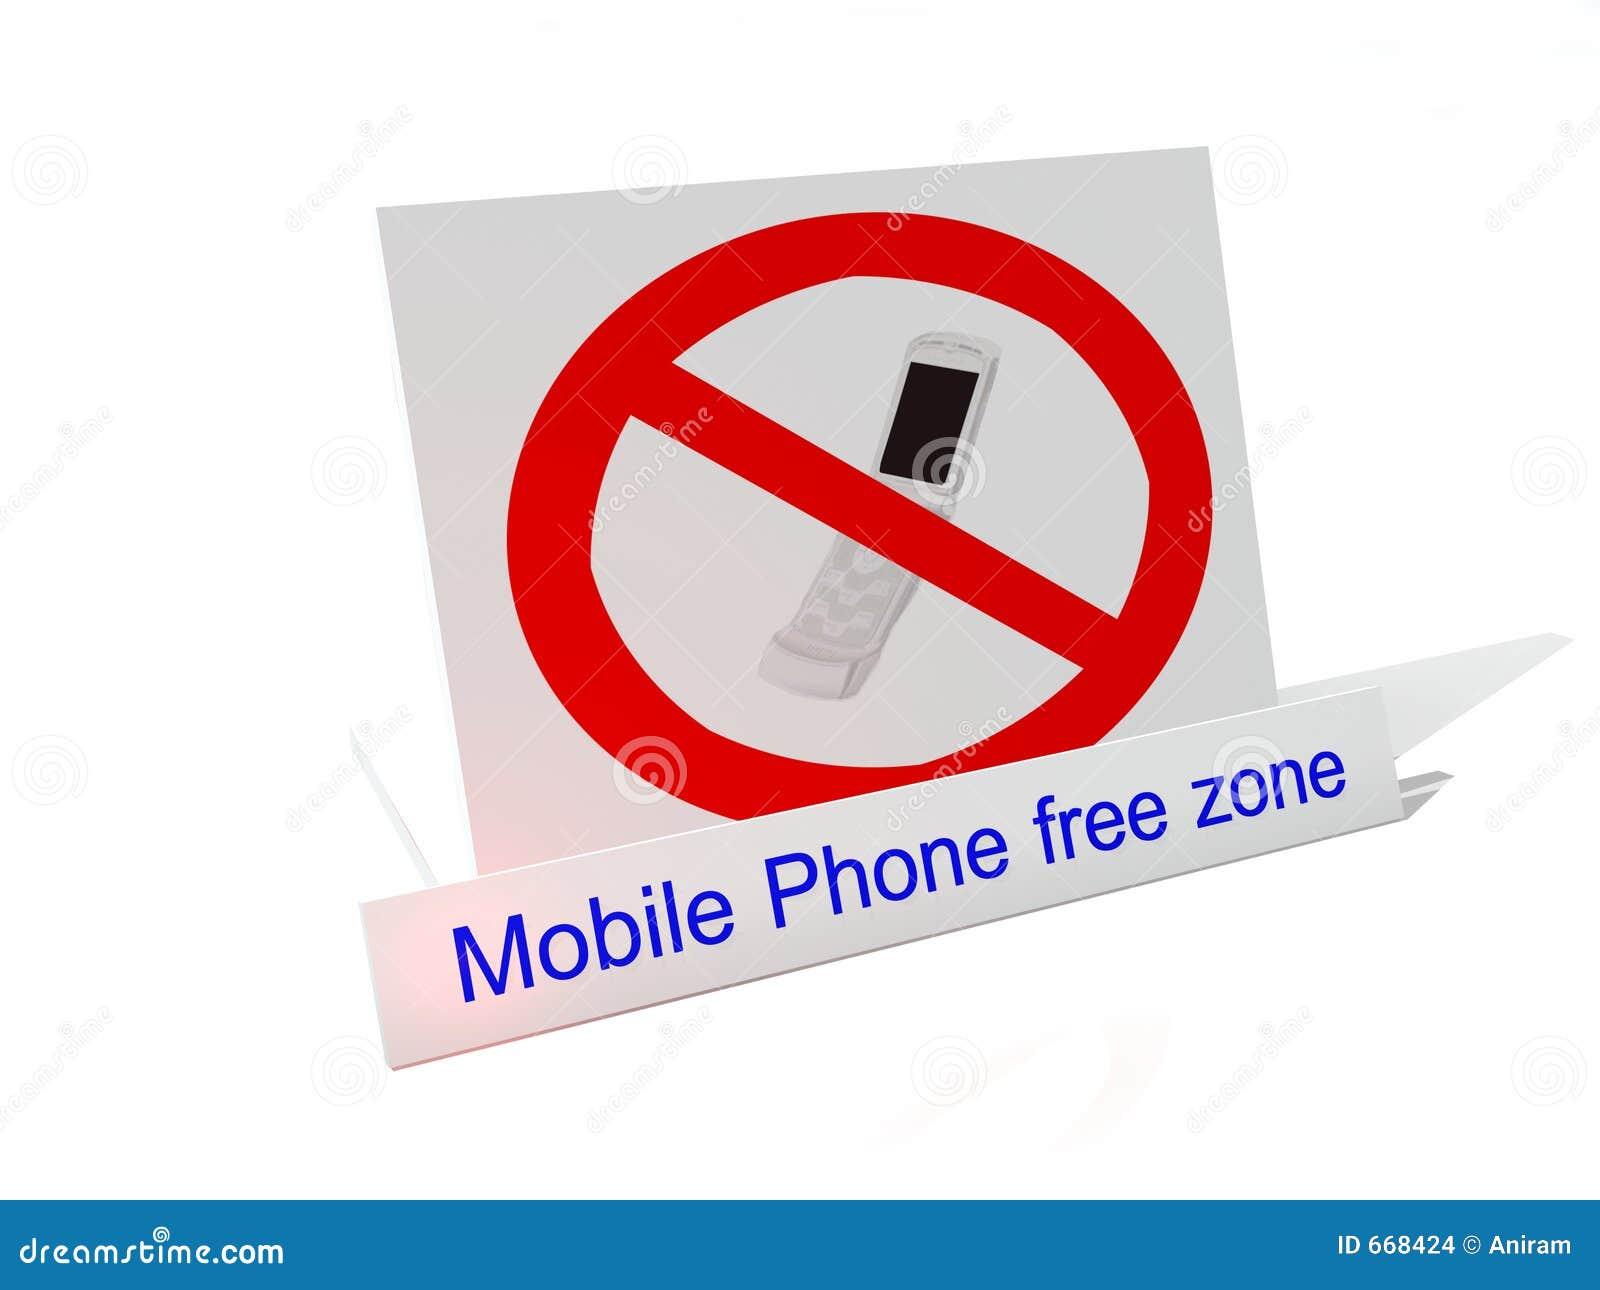 mobile phone free zone stock images image 668424. Black Bedroom Furniture Sets. Home Design Ideas